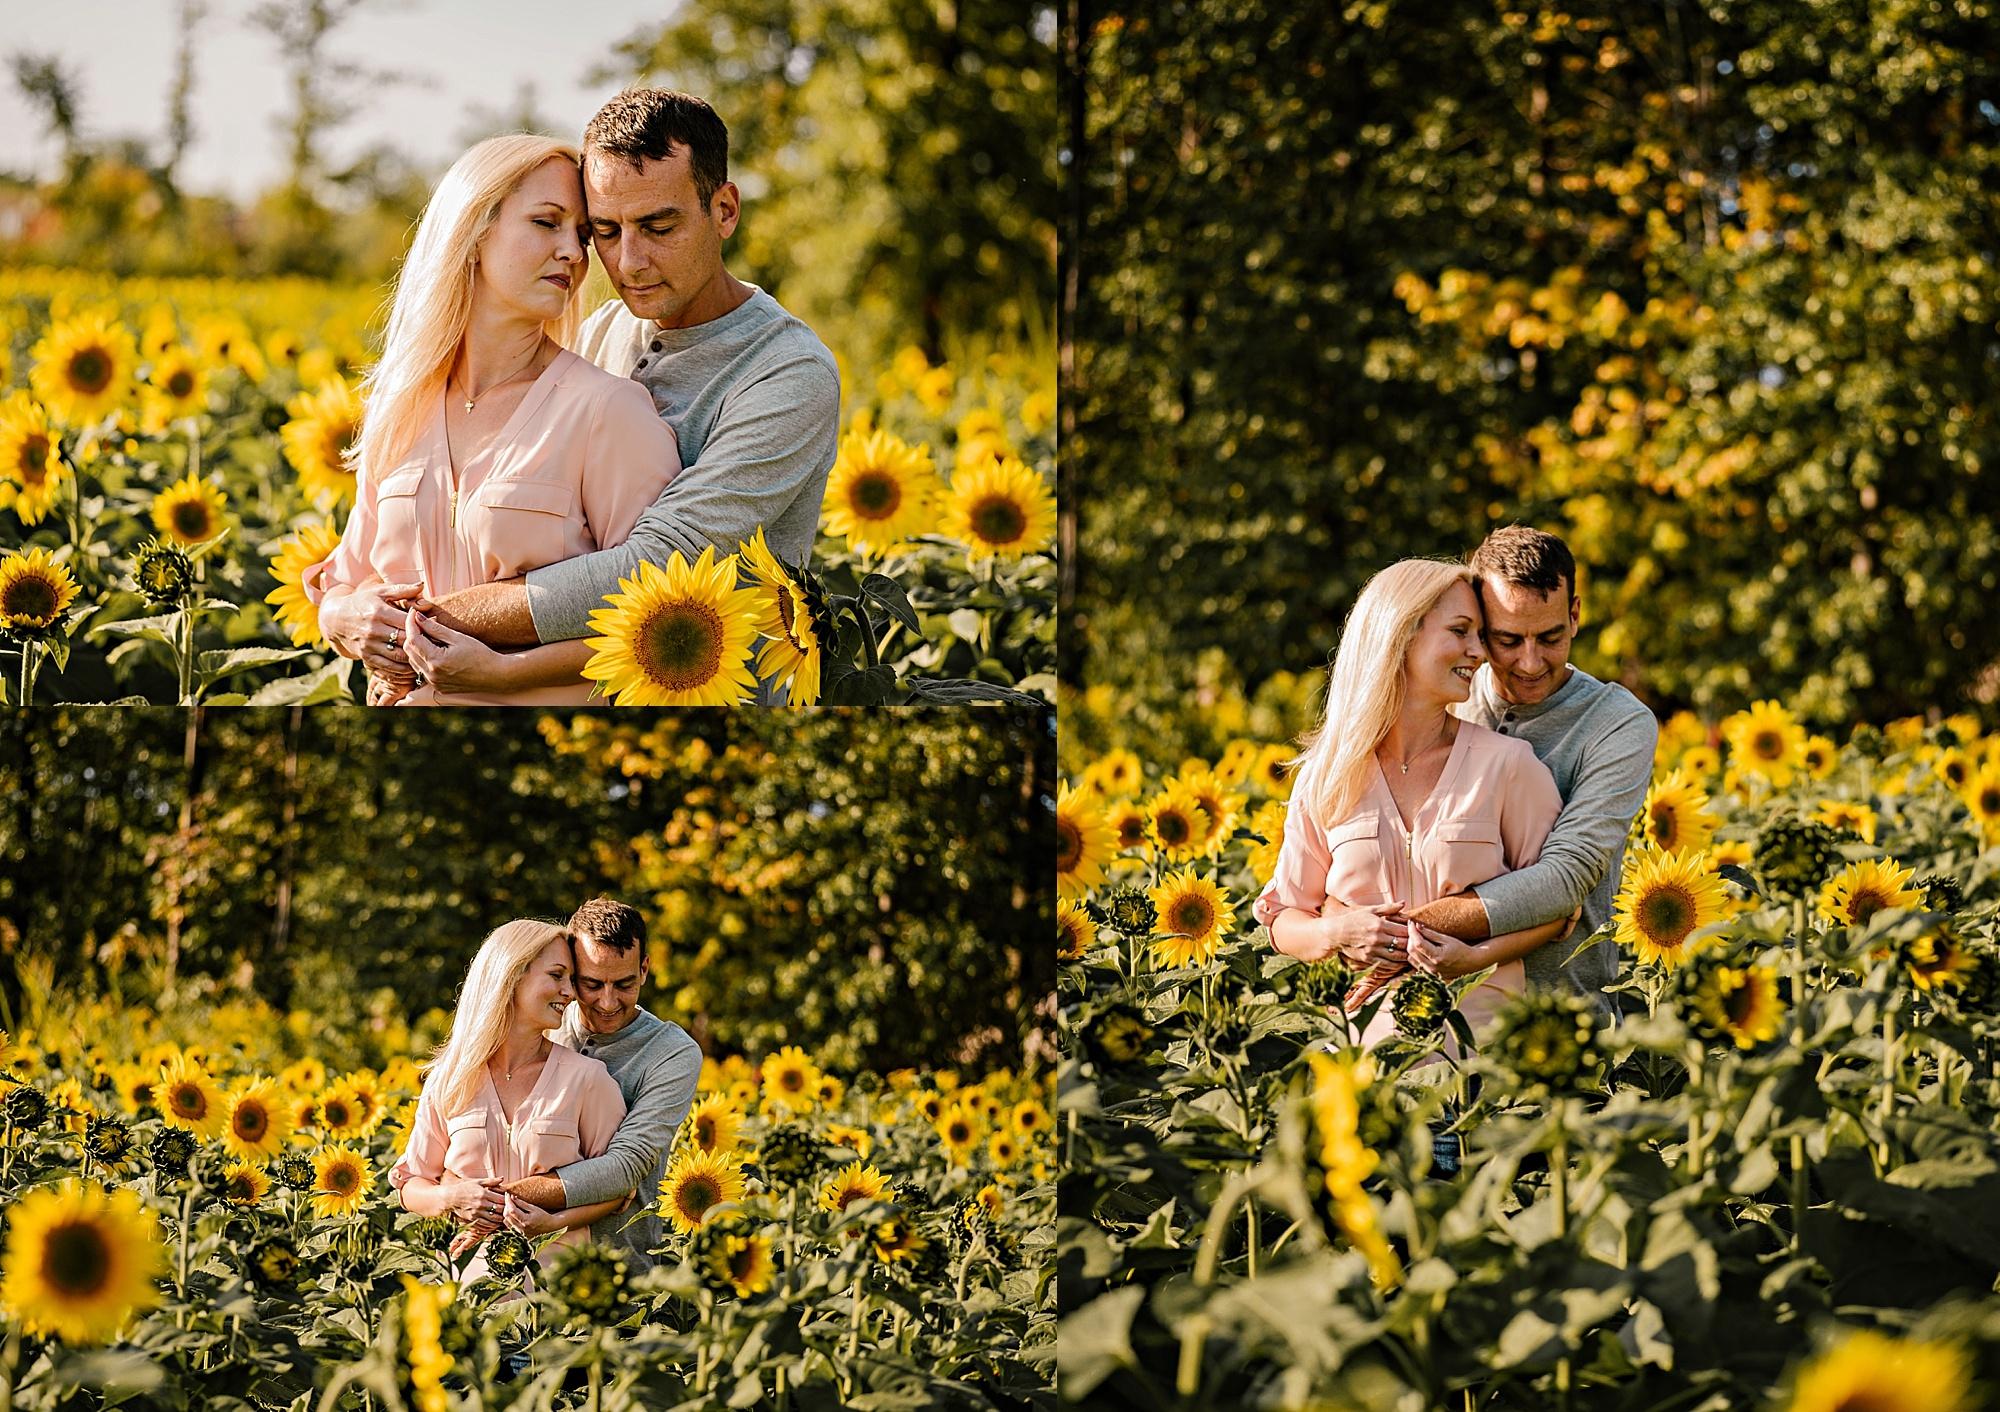 Lori-and-mike-akron-ohio-photographer-lauren-grayson-sunflower-field-session_0006.jpg